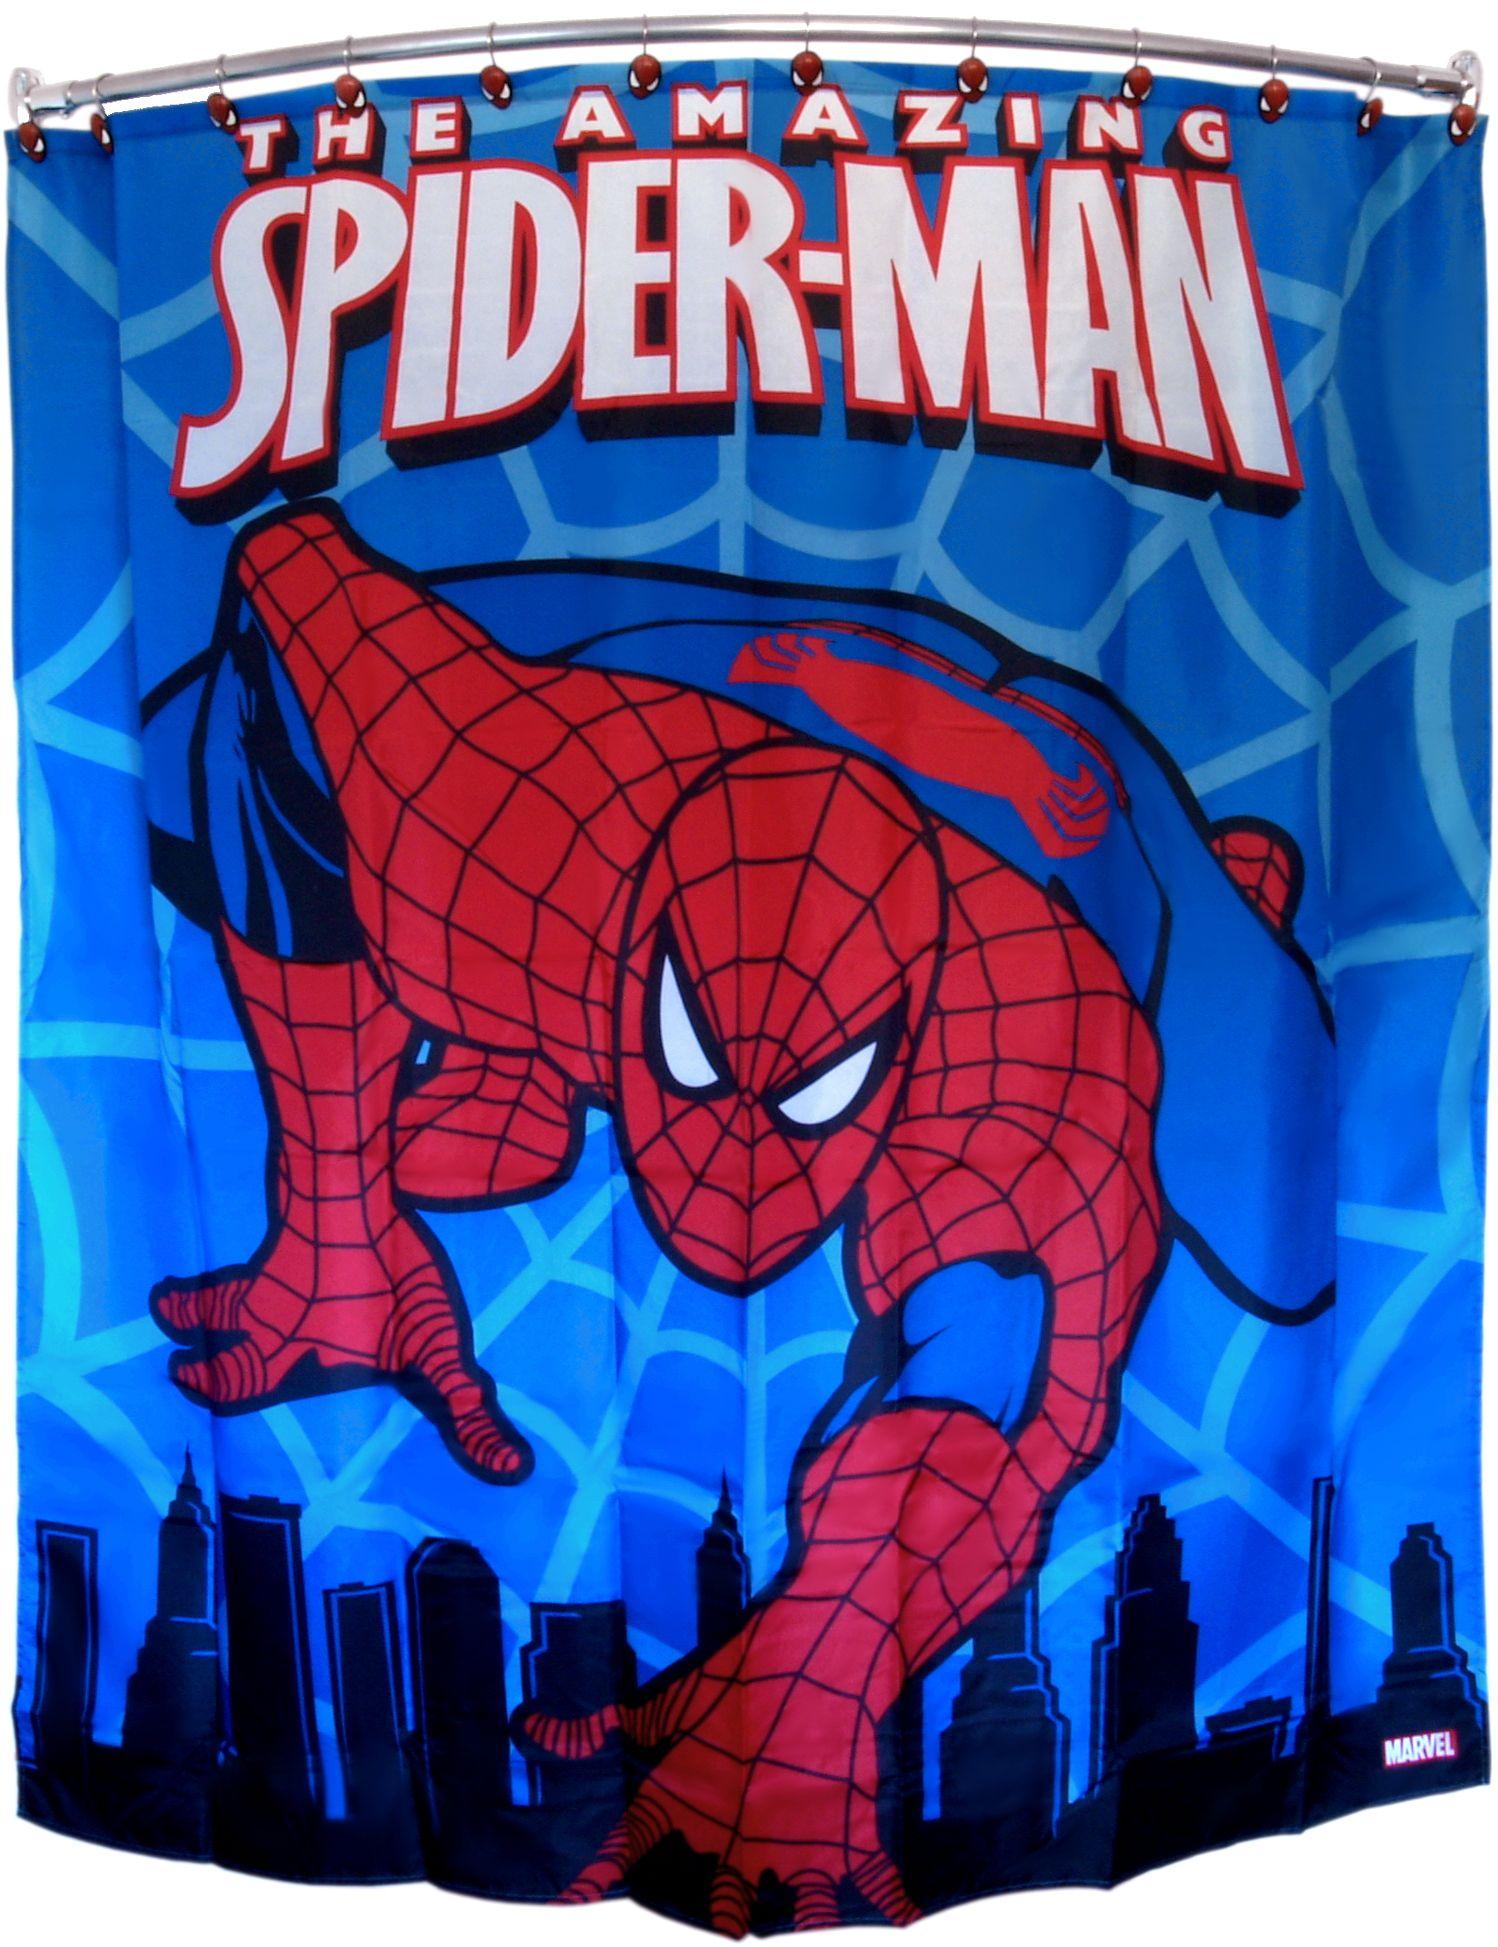 Marvel Spiderman Polyester 70 X 72 Inch Shower Curtain Superhero